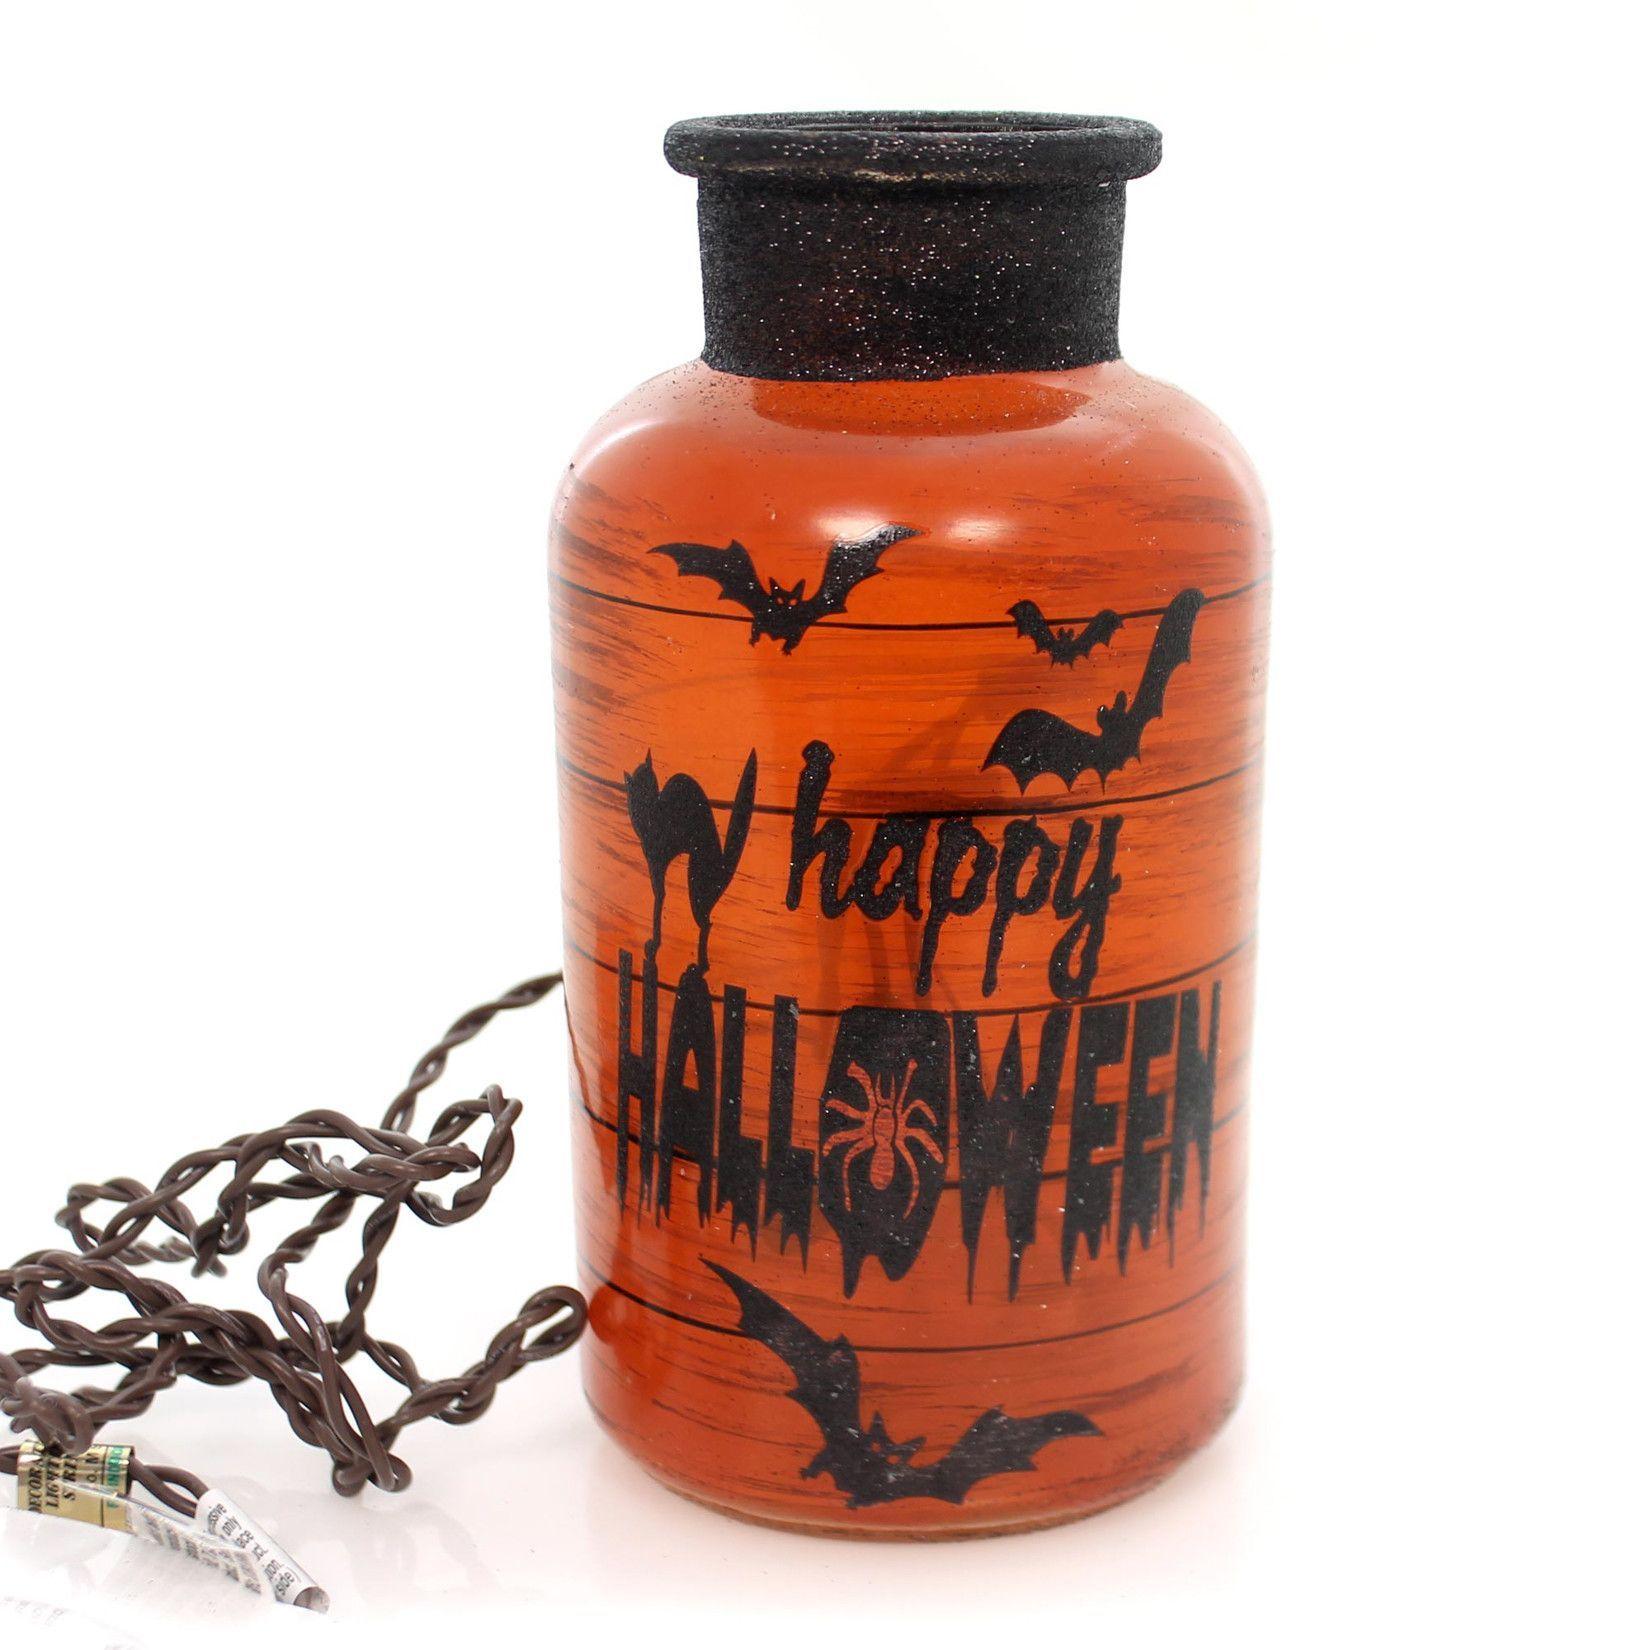 Stony Creek Halloween Lit Jar Halloween Decor | Tomb Sweet Tomb ...